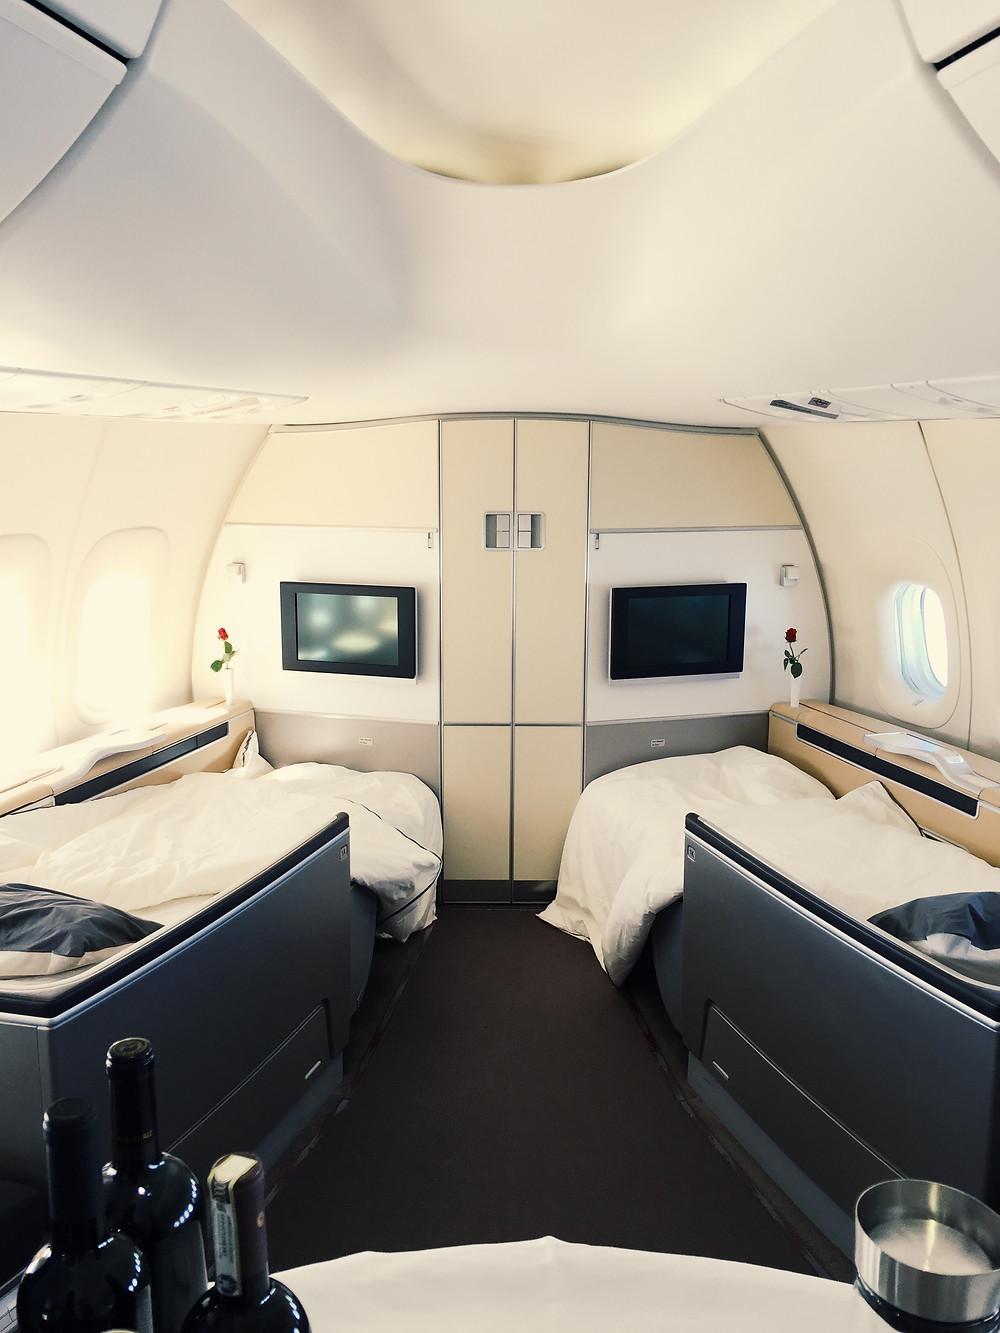 Lufthansa First Class, Turndown Service